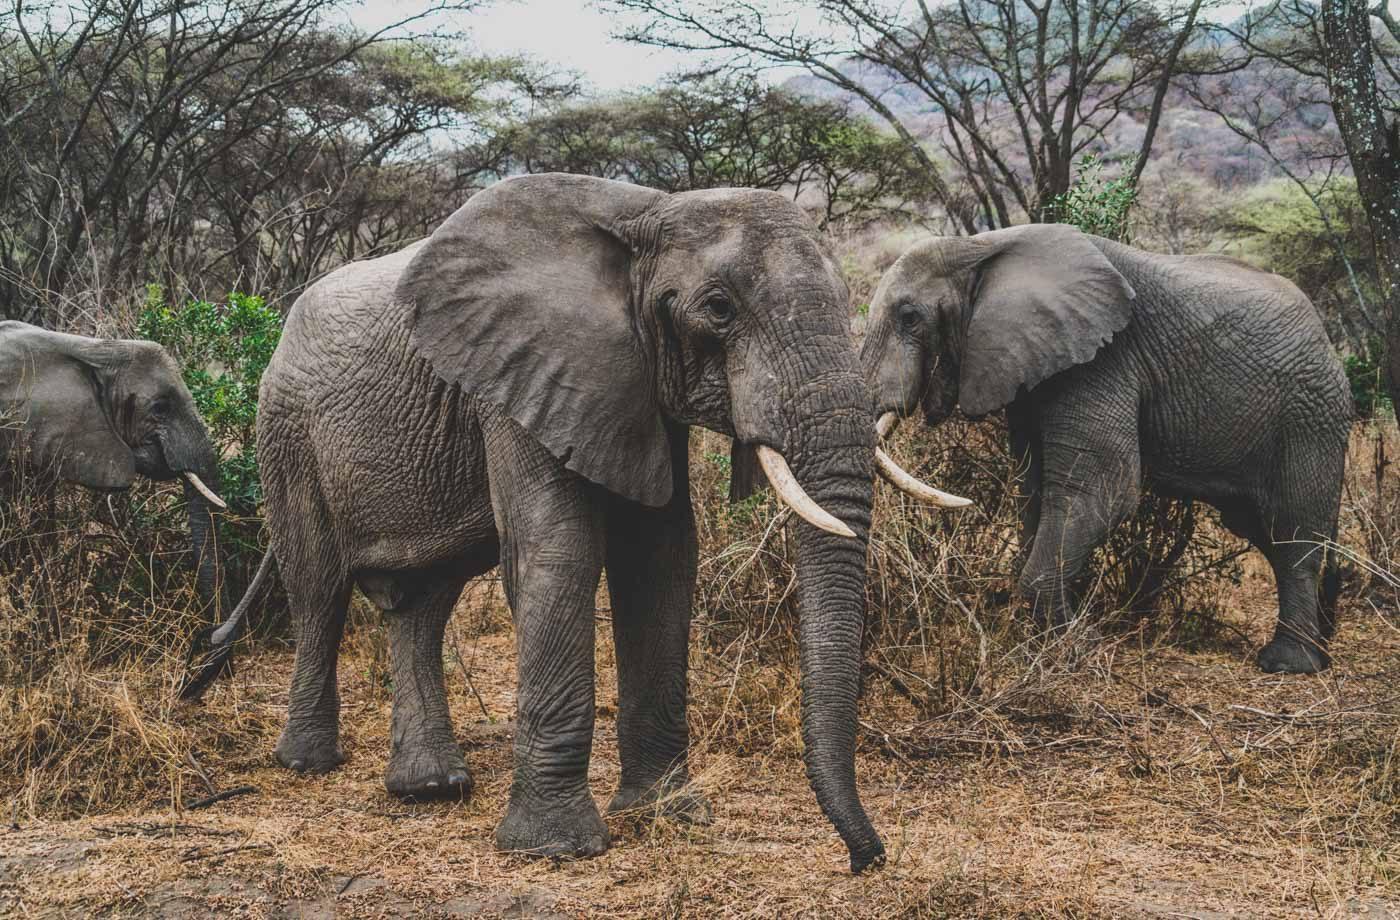 Serengeti Safari big 5, elephants